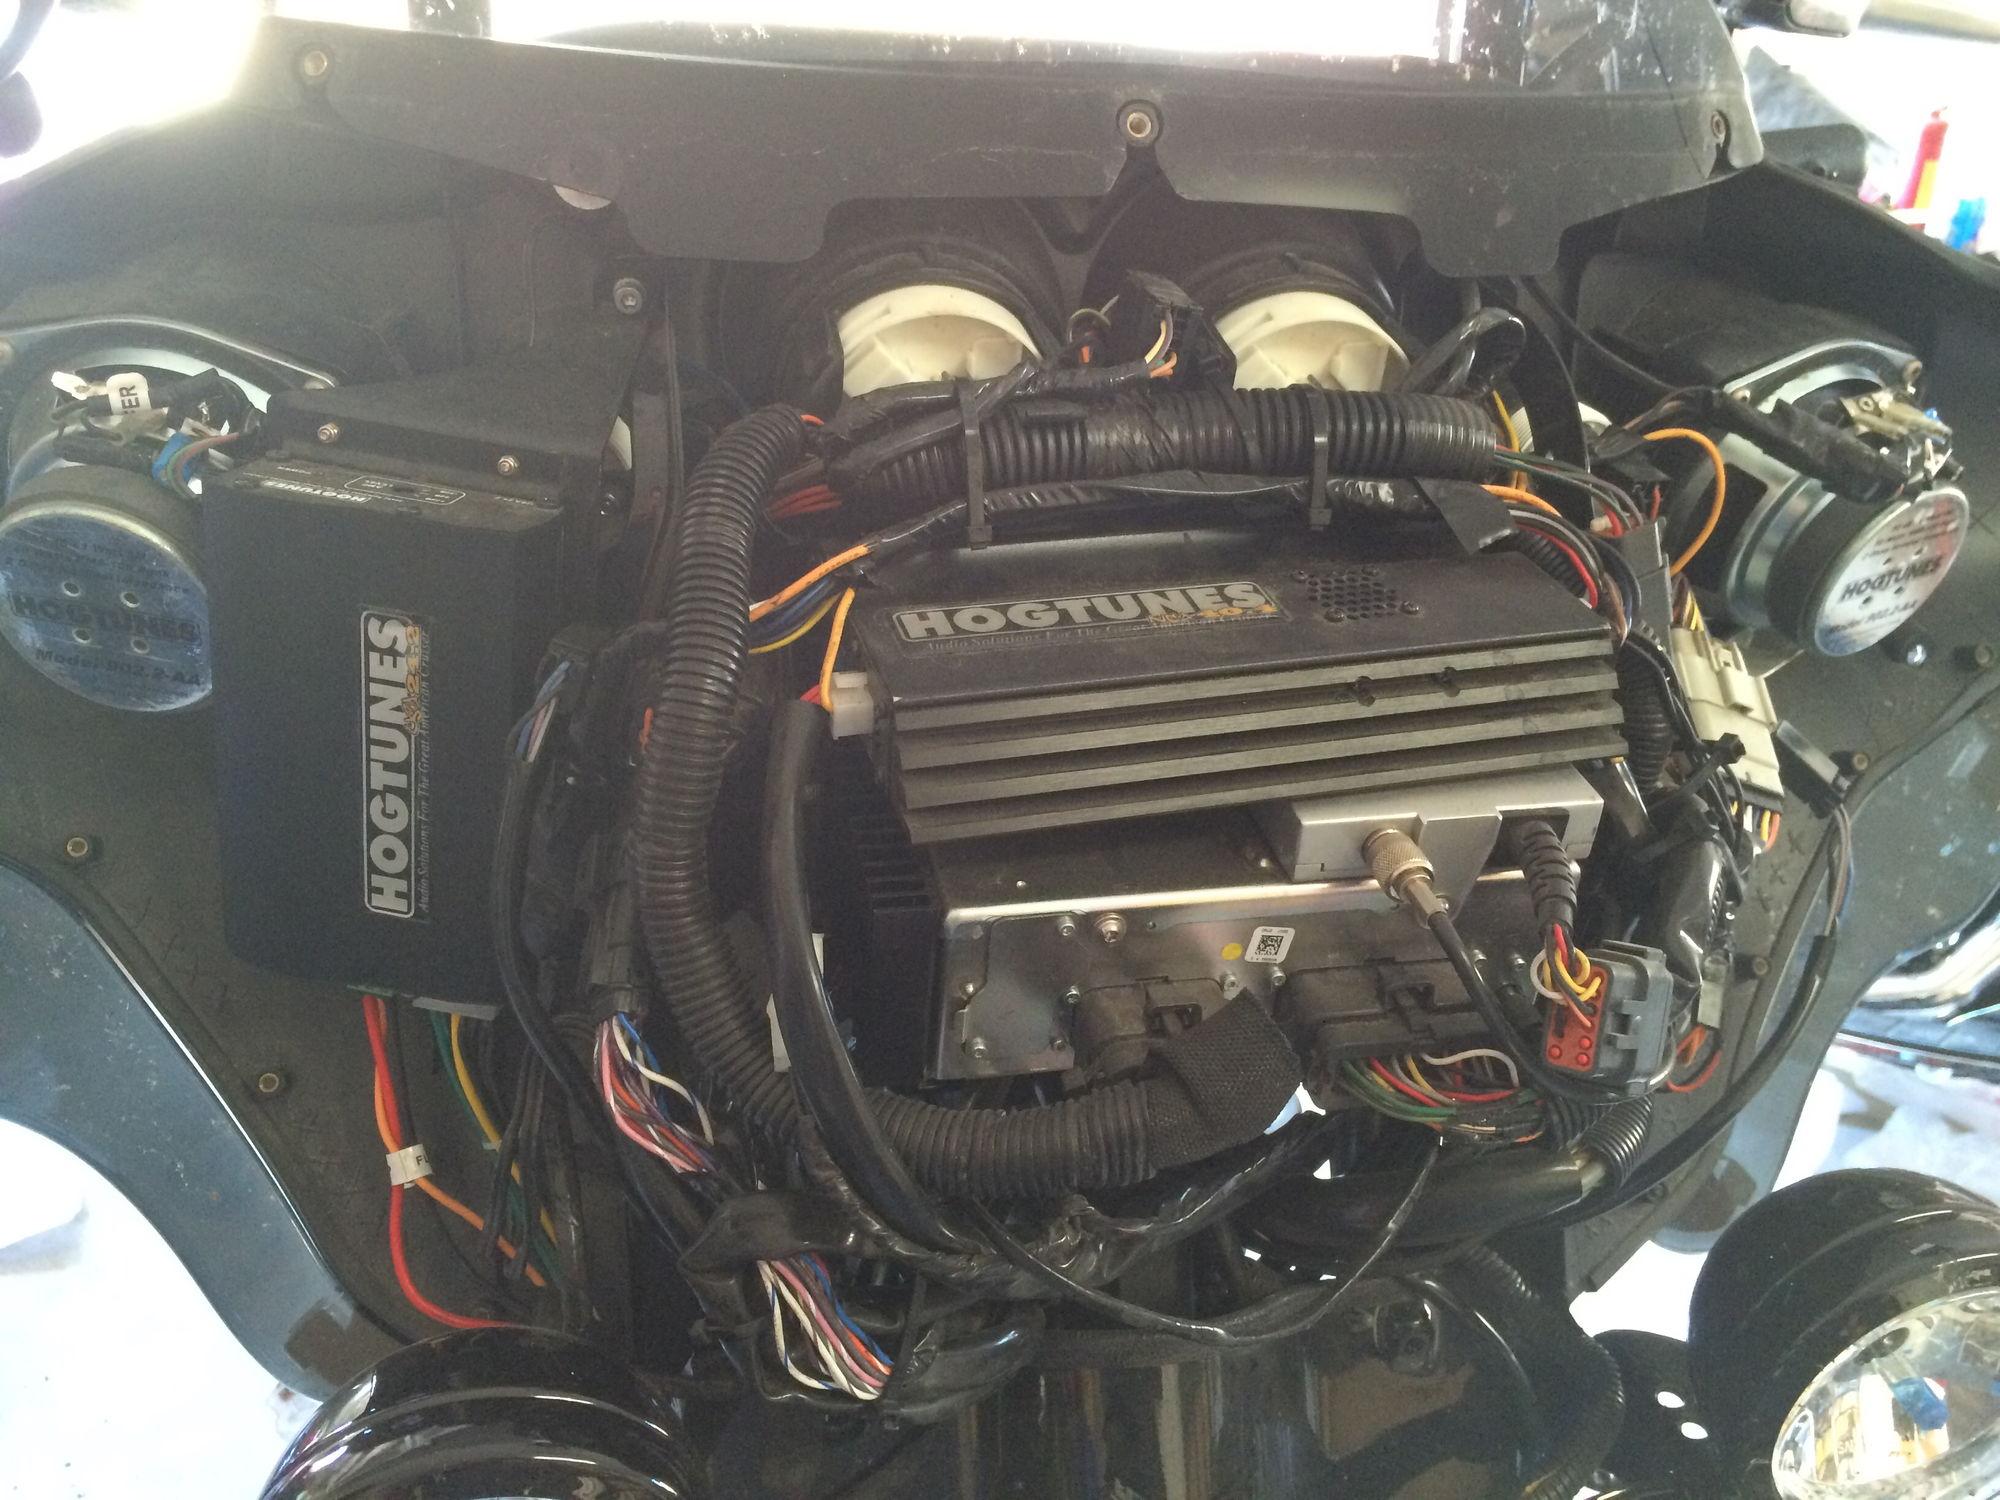 HogTunes 24.2 Amp Pins - Harley Davidson Forums